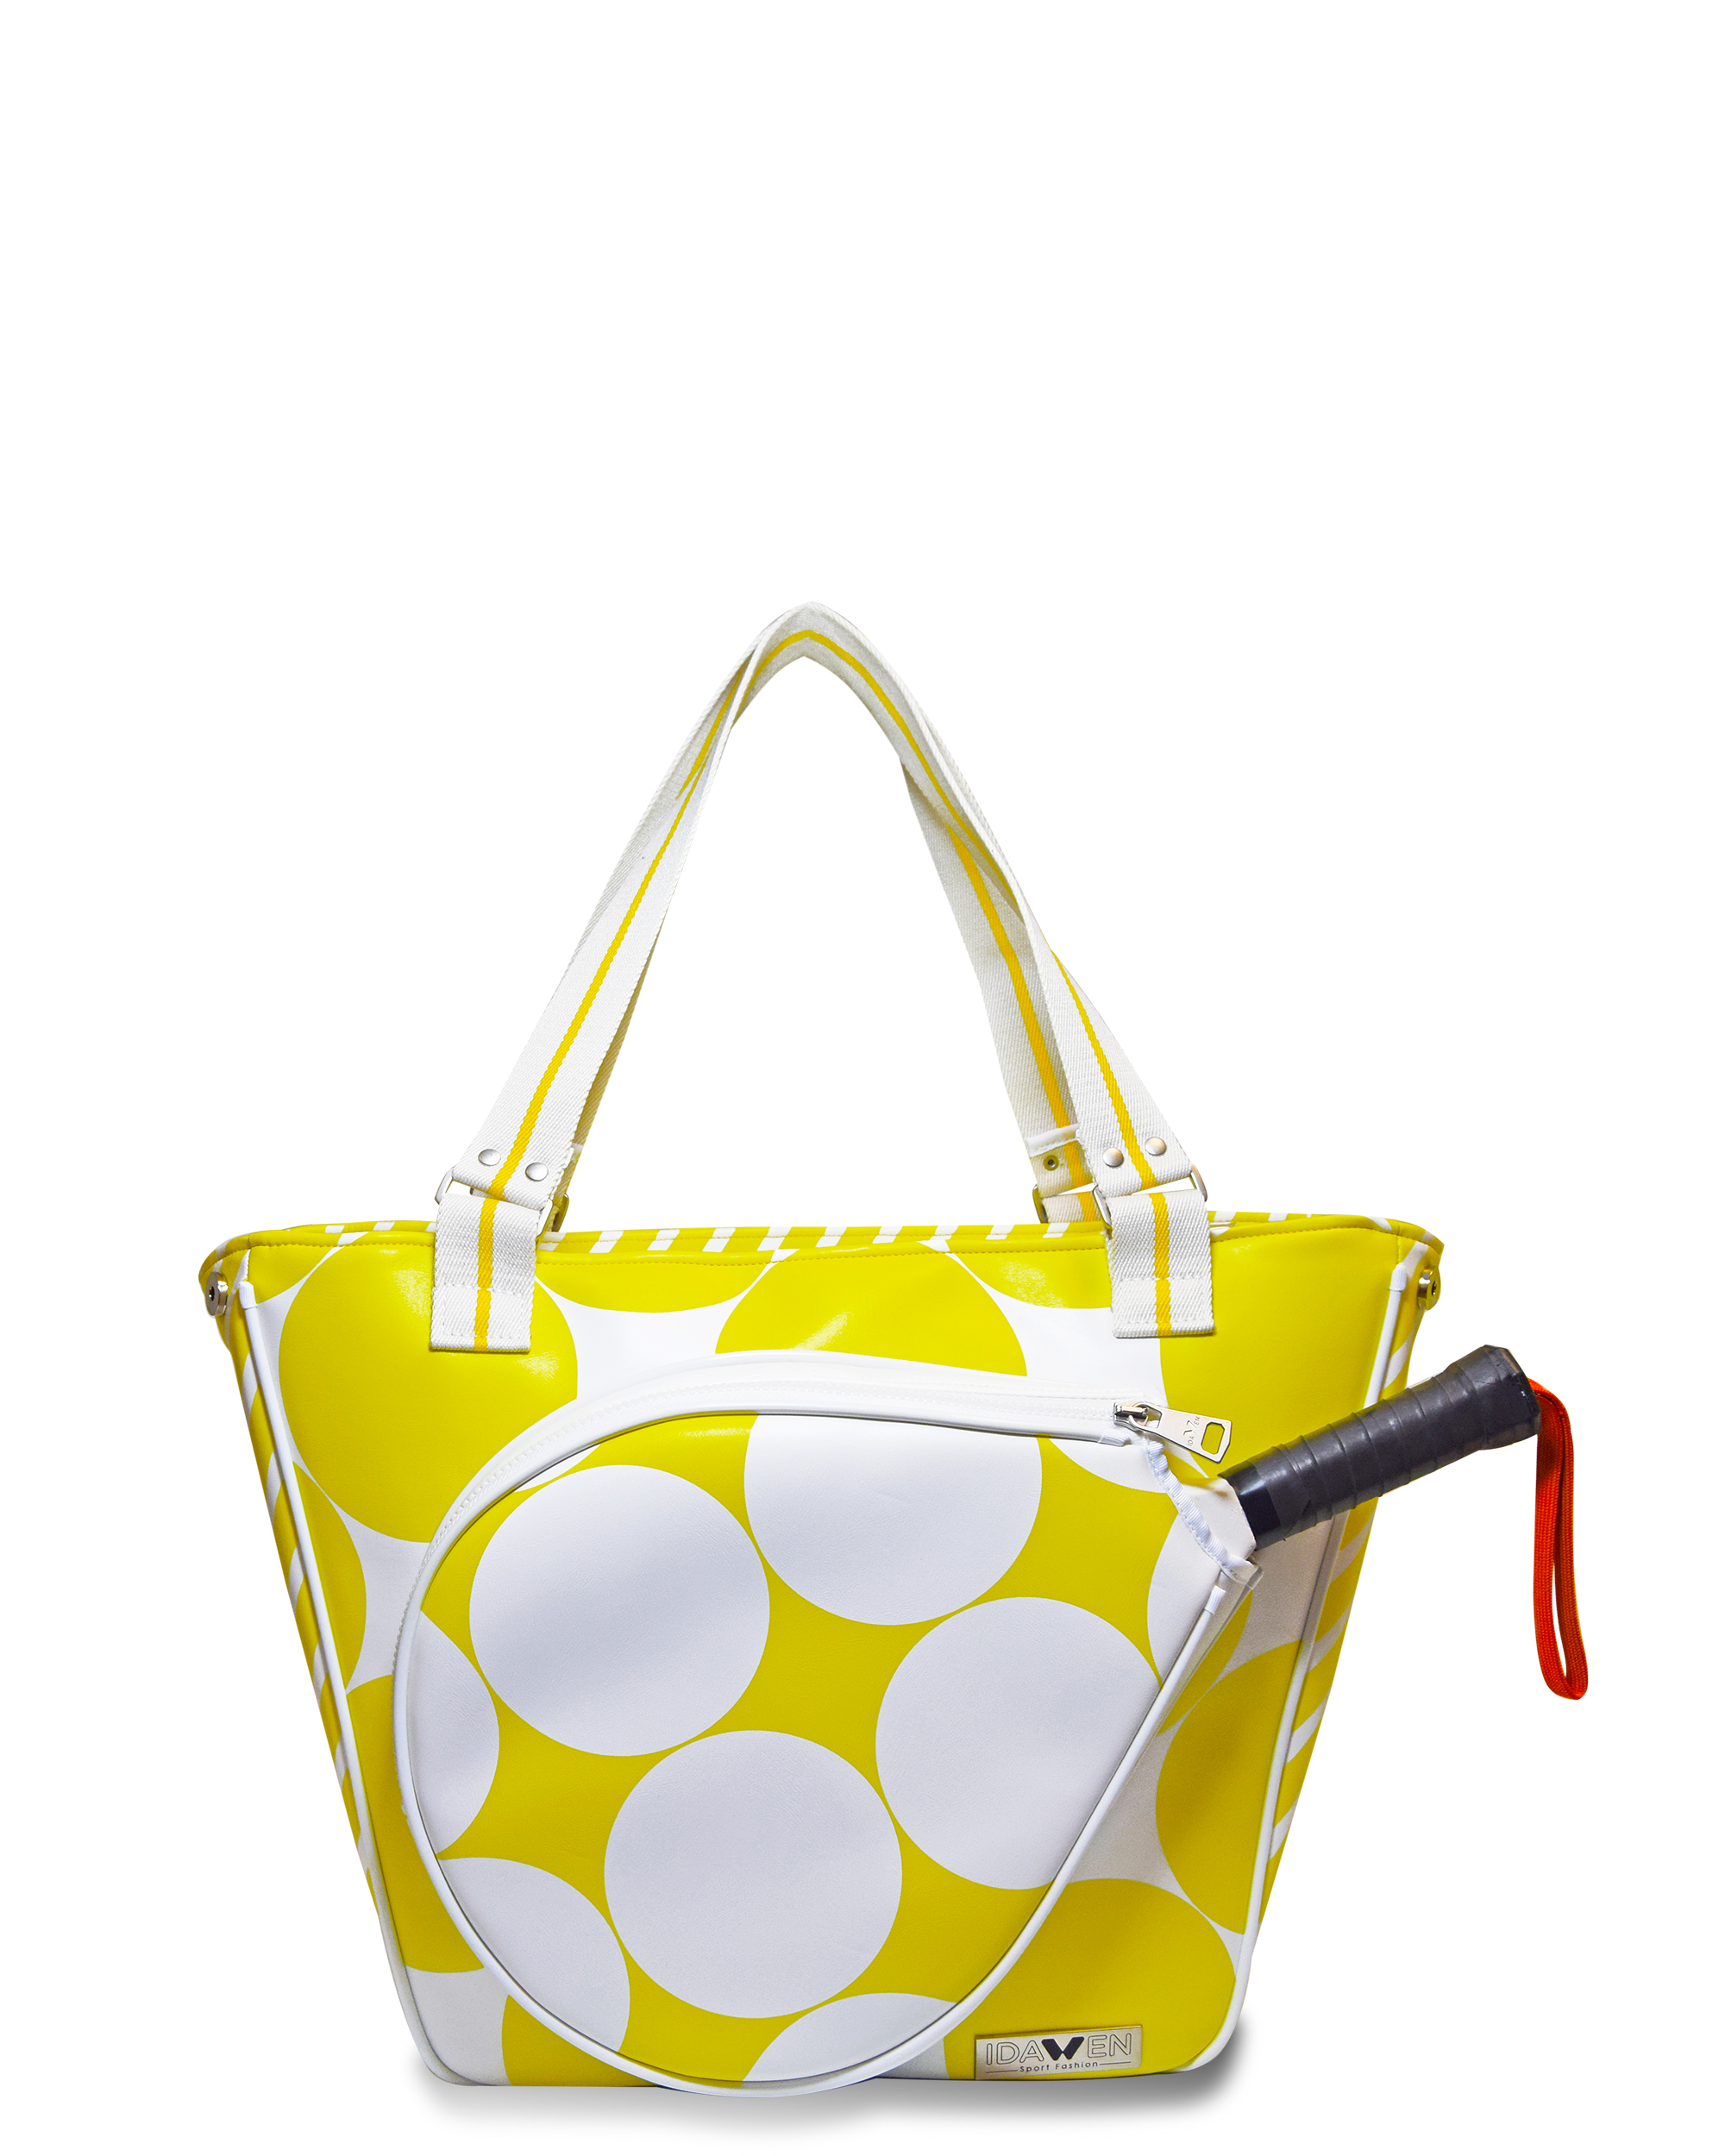 TOTE PADEL YELLOW BAG PADDLE BAGS CE IDAWEN - Woman and Fashion